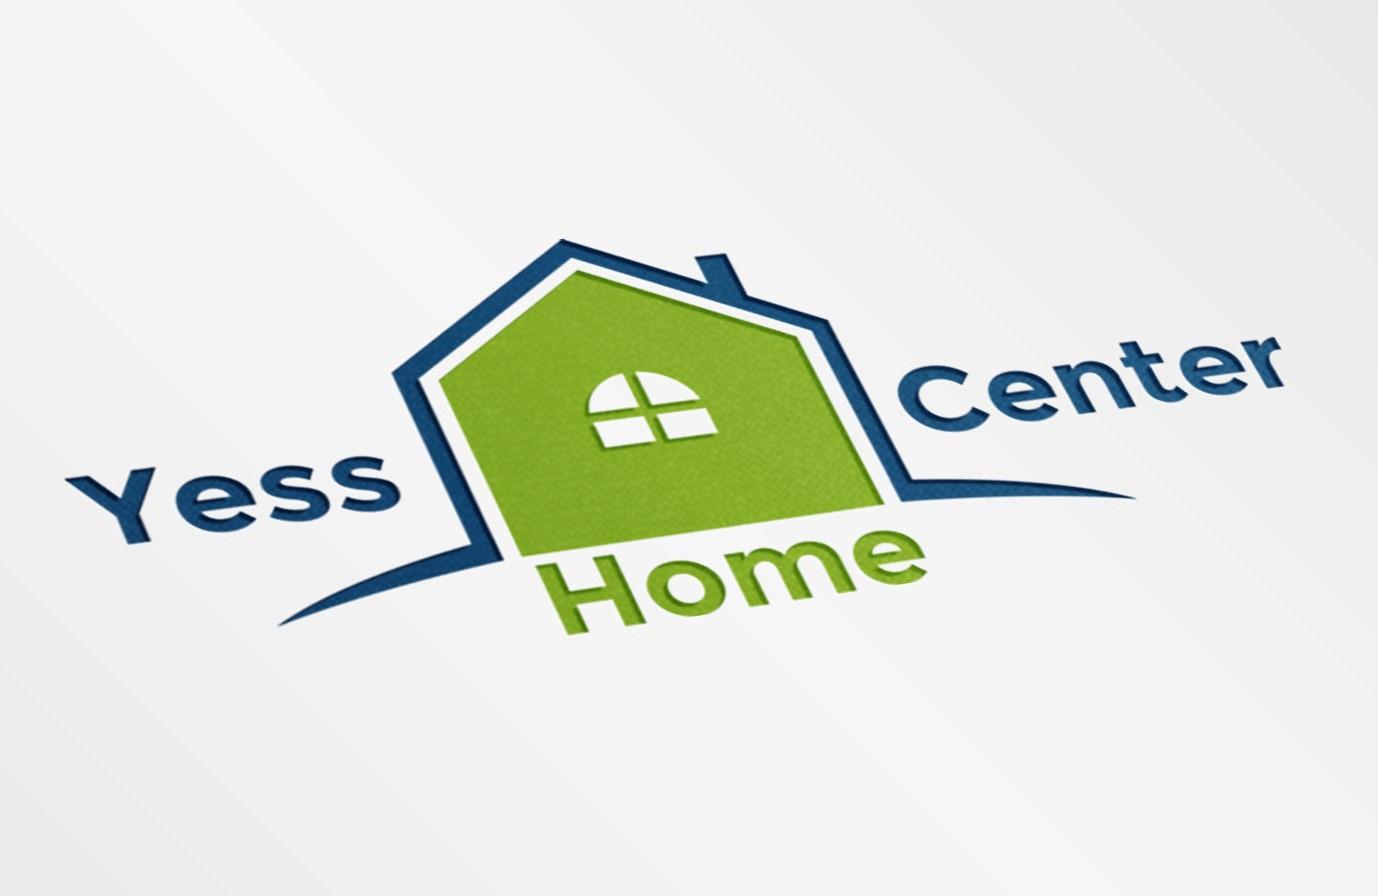 Yess Home Center